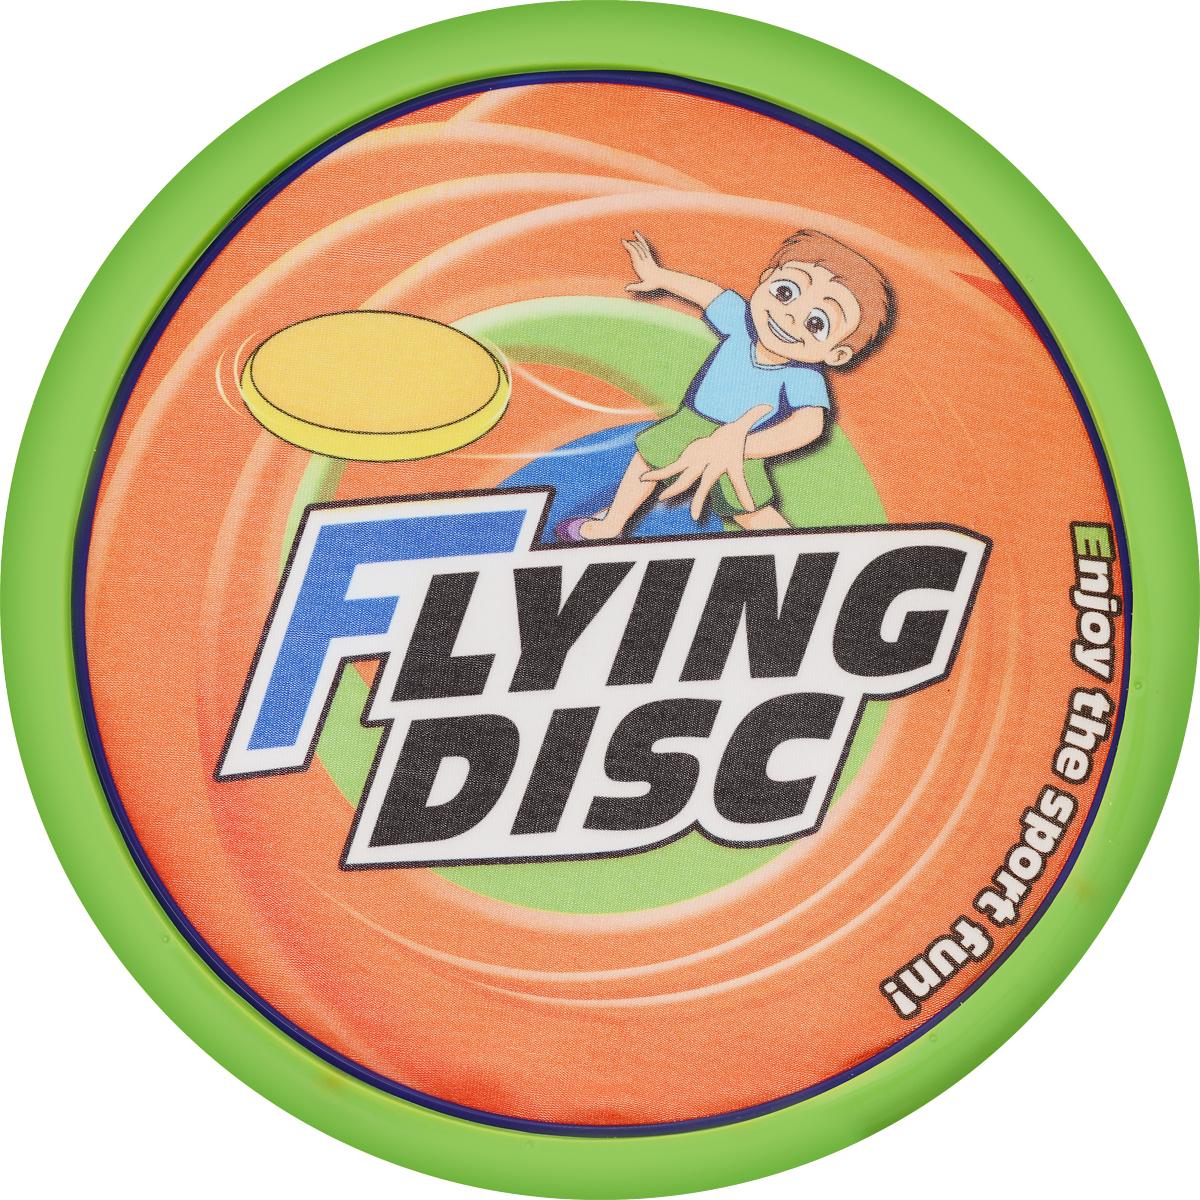 цена на YG Sport Летающая тарелка цвет салатовый оранжевый диаметр 20 см